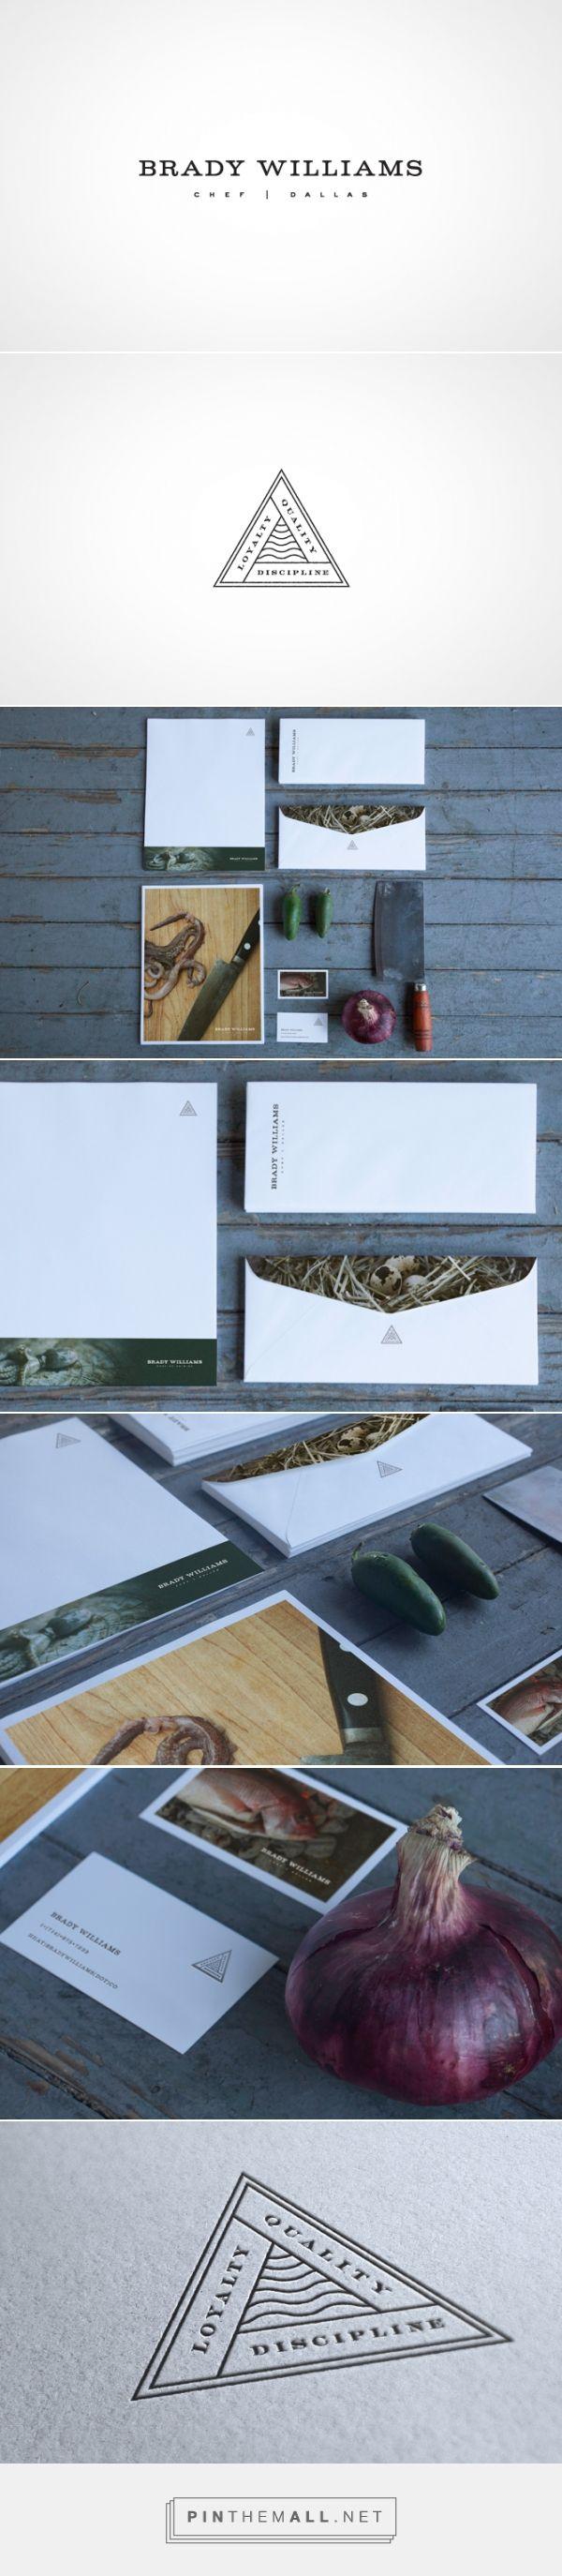 Brady Williams Branding by FoundryCo.   Fivestar Branding – Design and Branding Agency & Inspiration Gallery